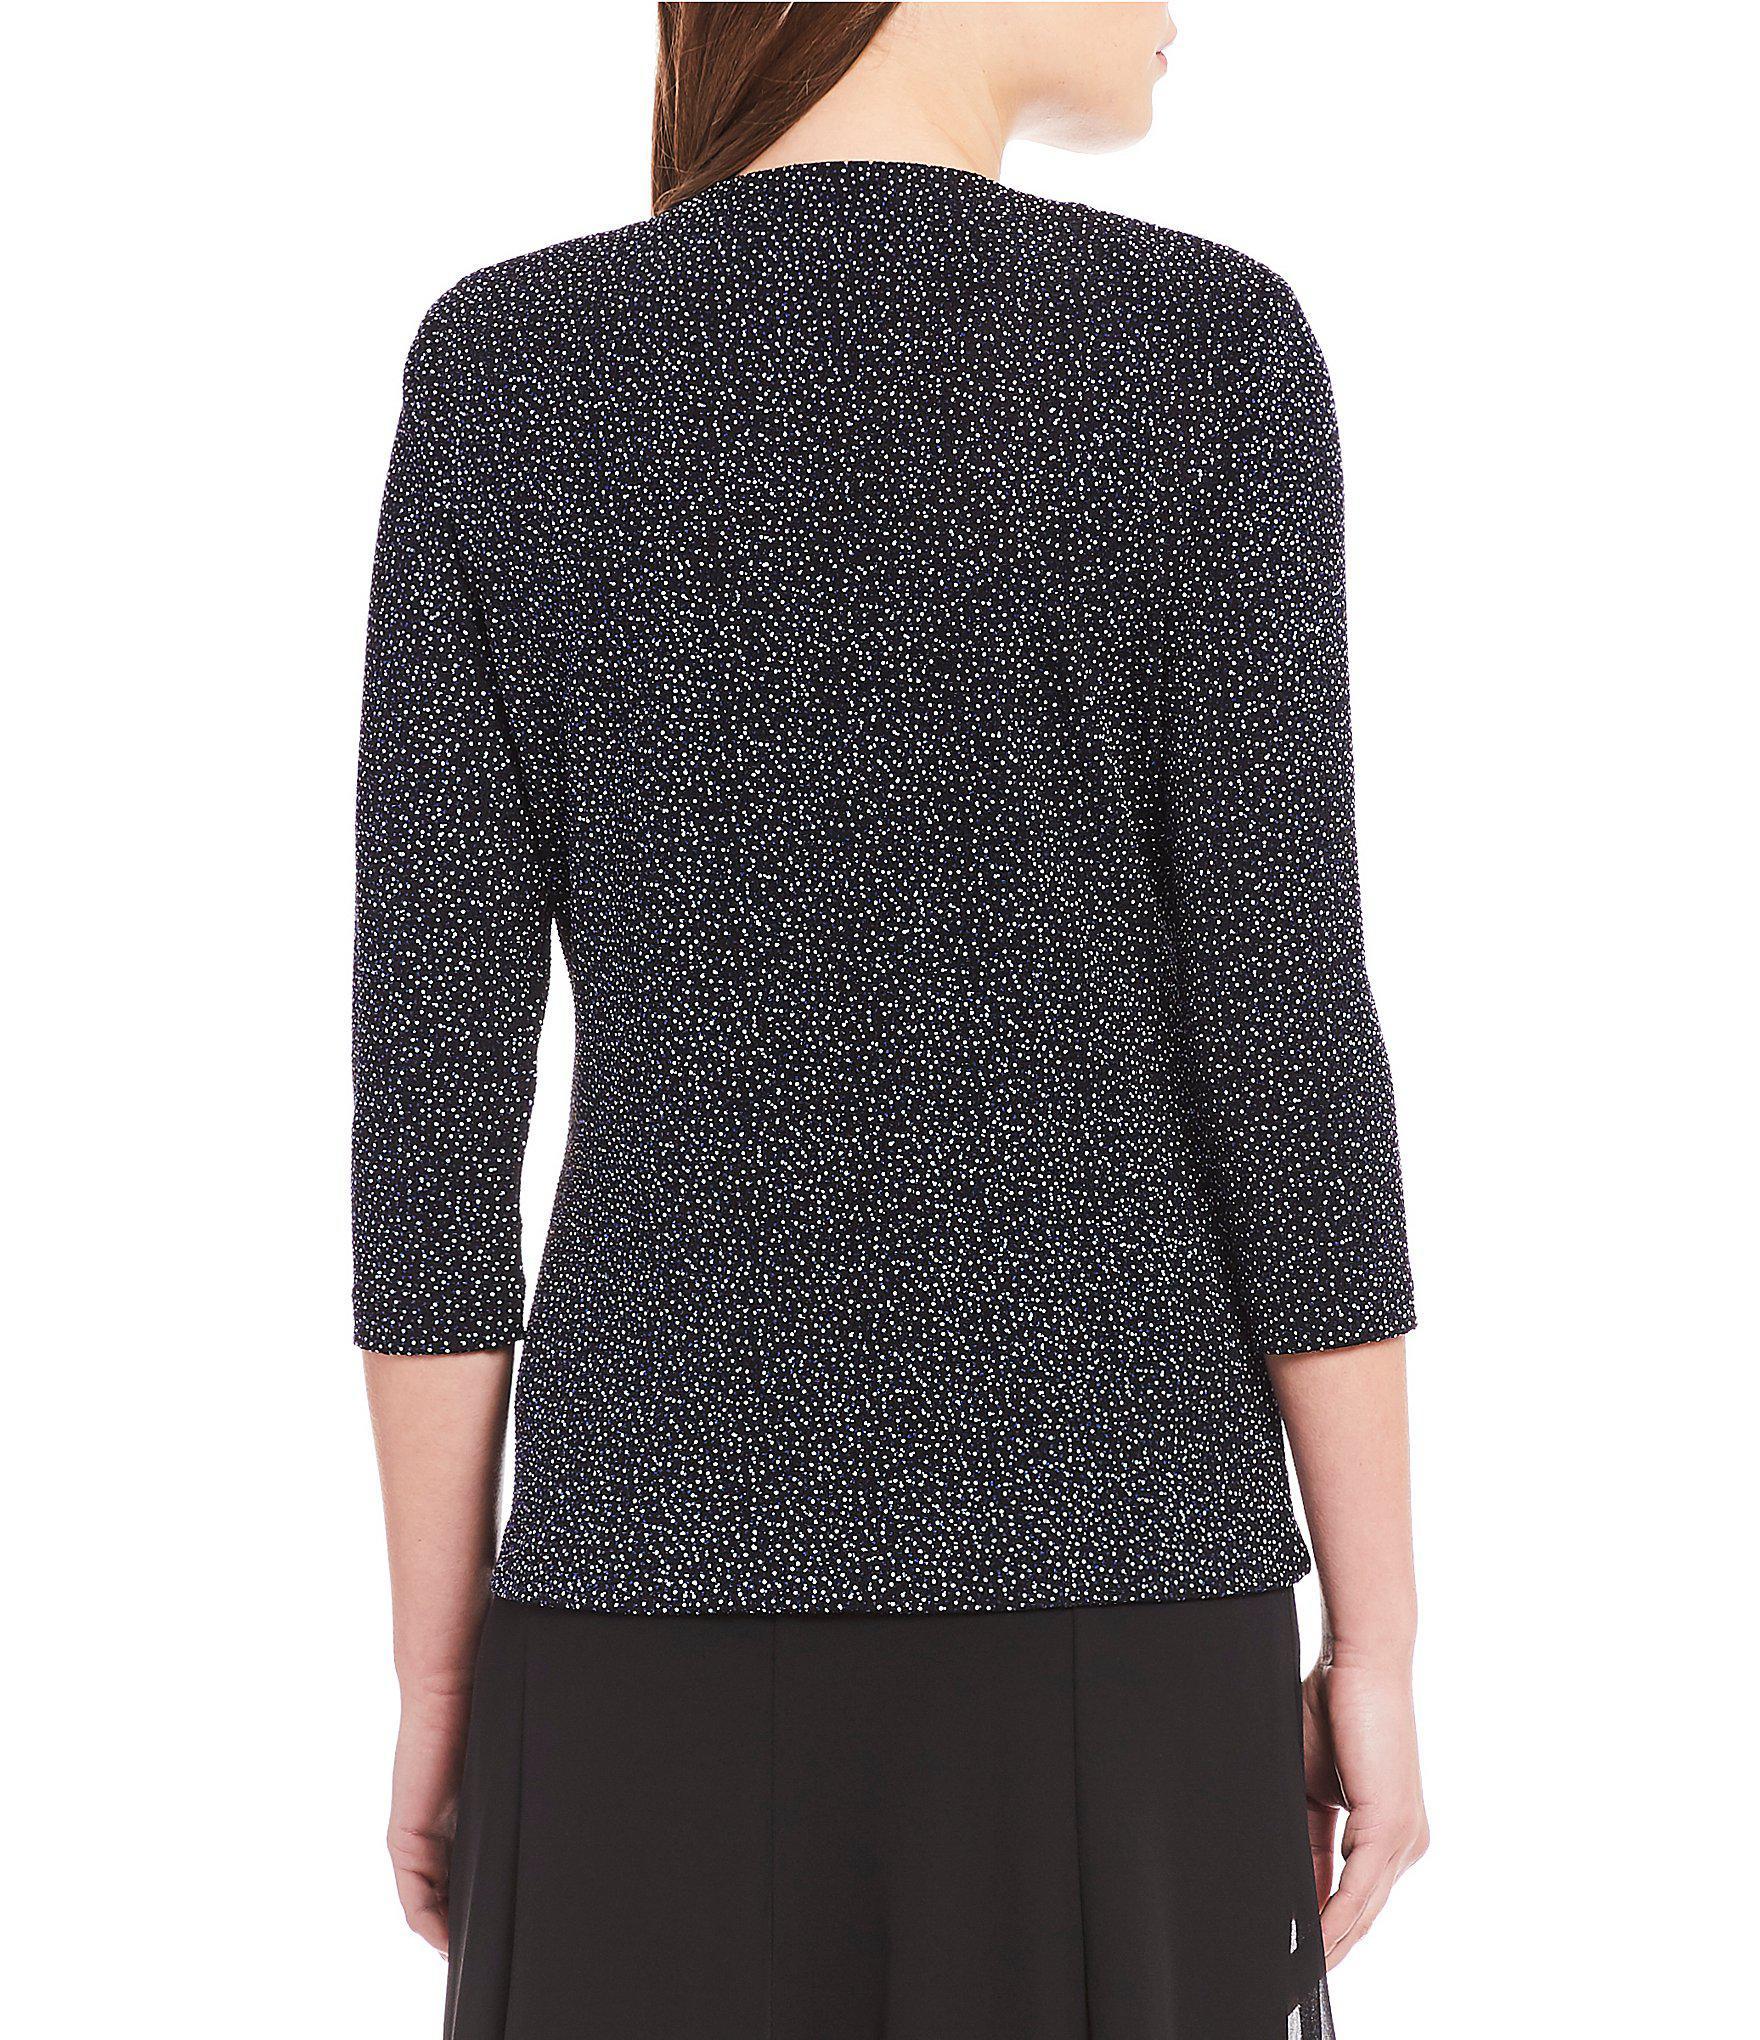 a847a32c8f8 Alex Evenings - Black 3 4 Sleeve Printed Glitter Knit Twinset - Lyst. View  fullscreen